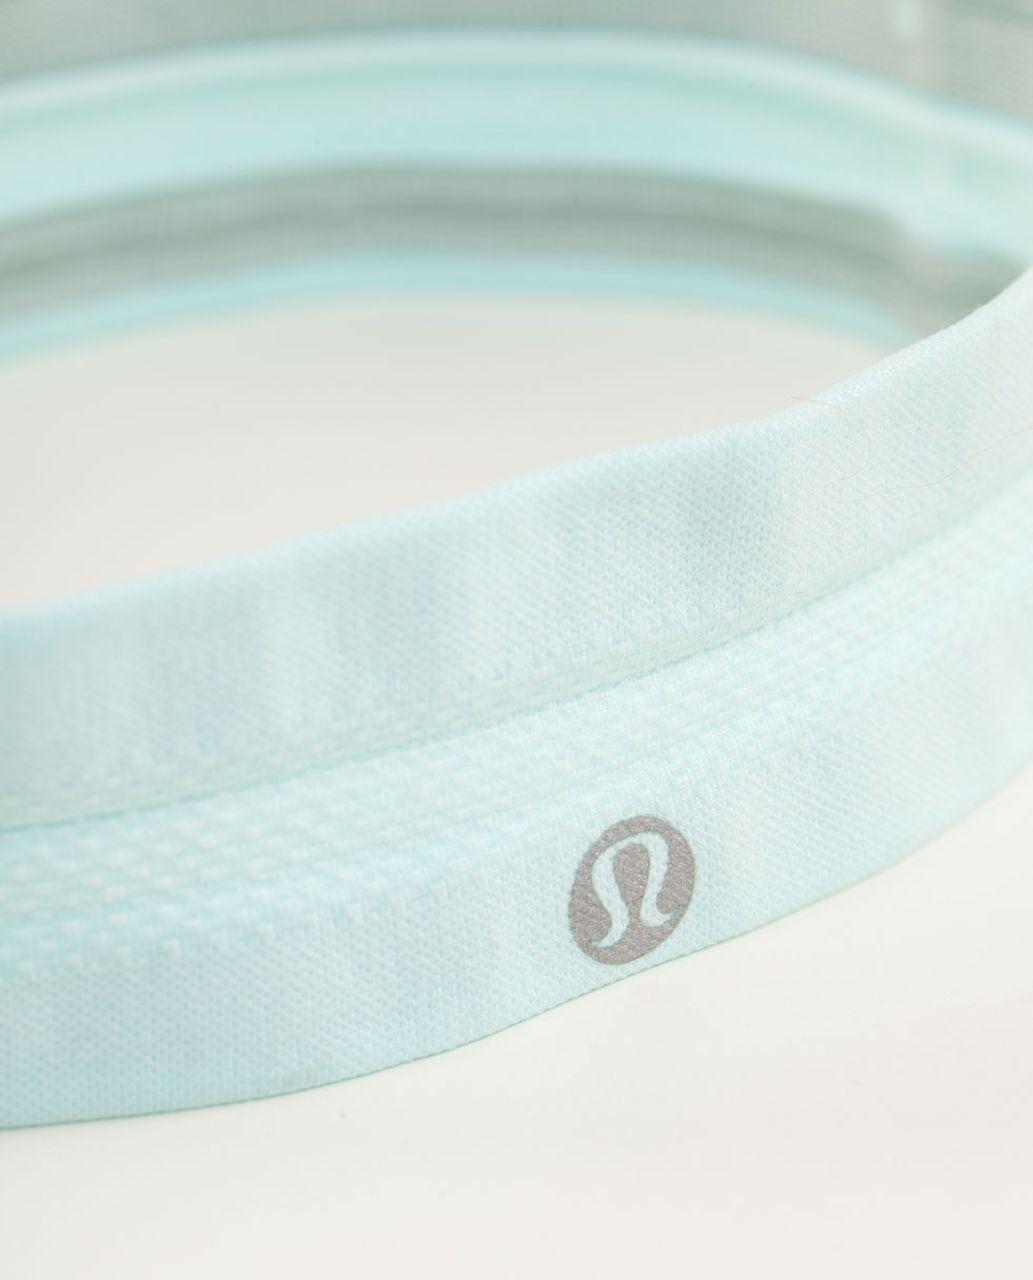 Lululemon Swiftly Headband - Aquamarine